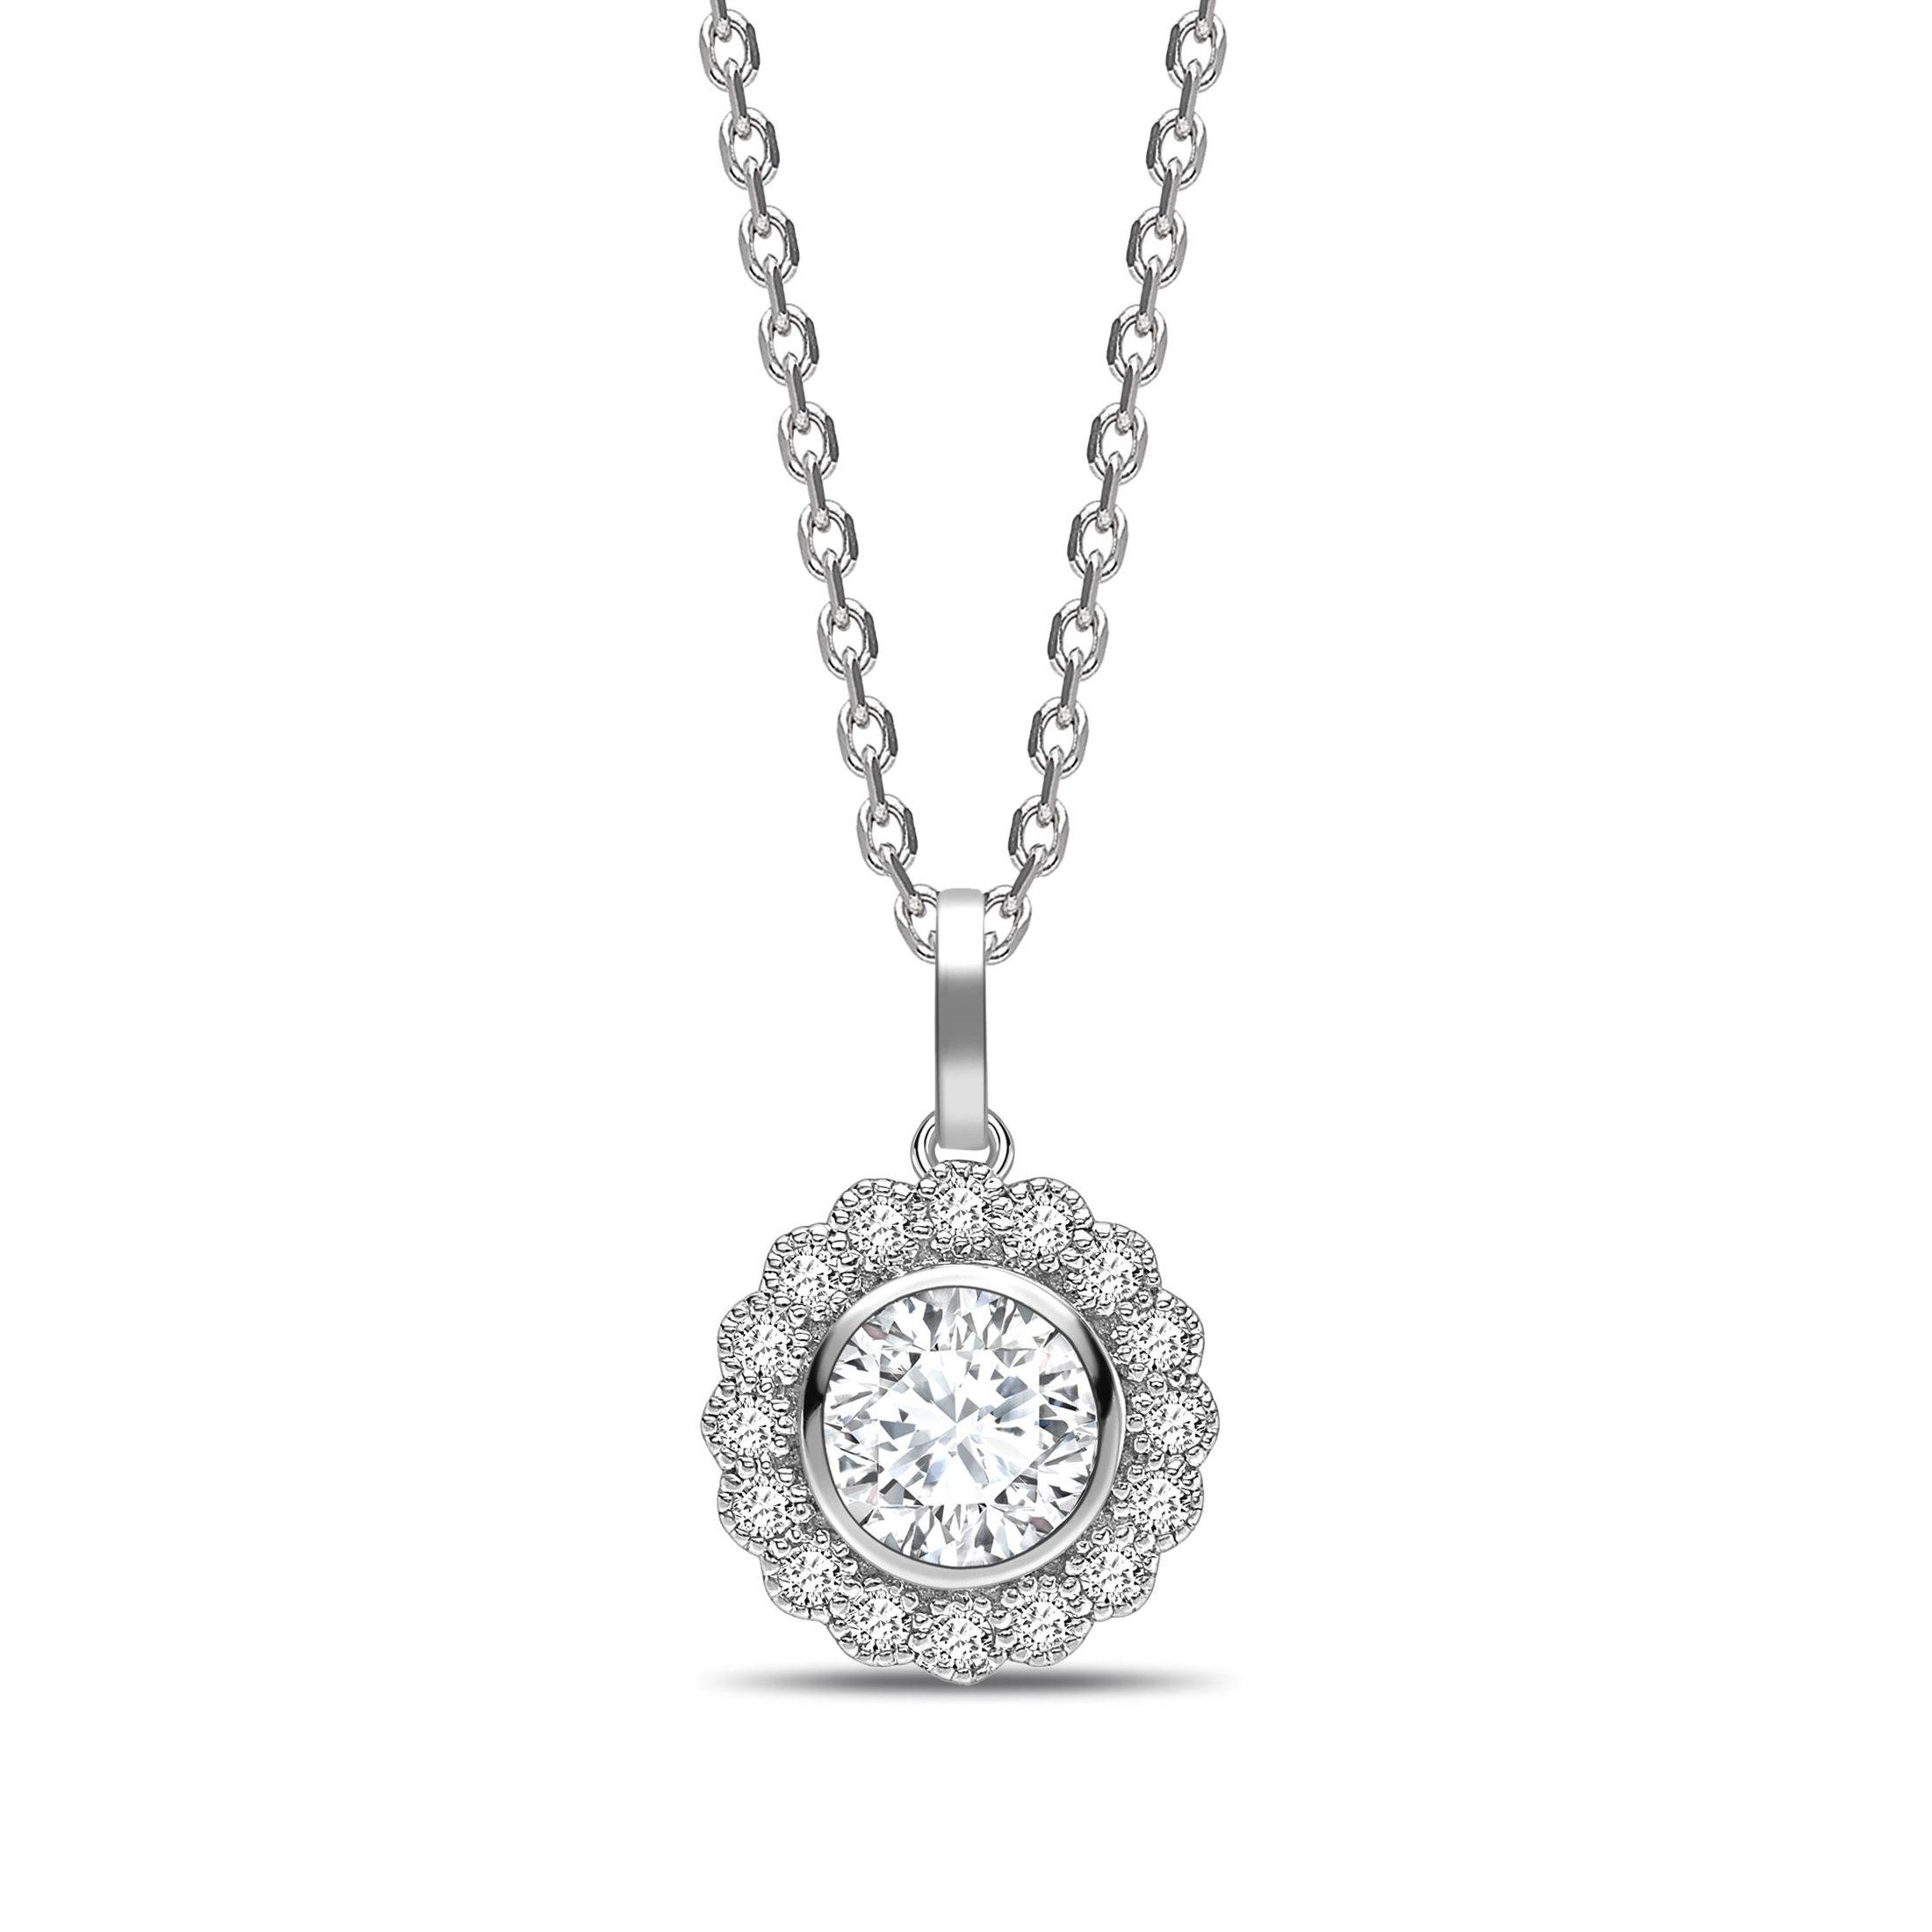 Miligrain Vintage Style Round Shape Halo Diamond Necklace